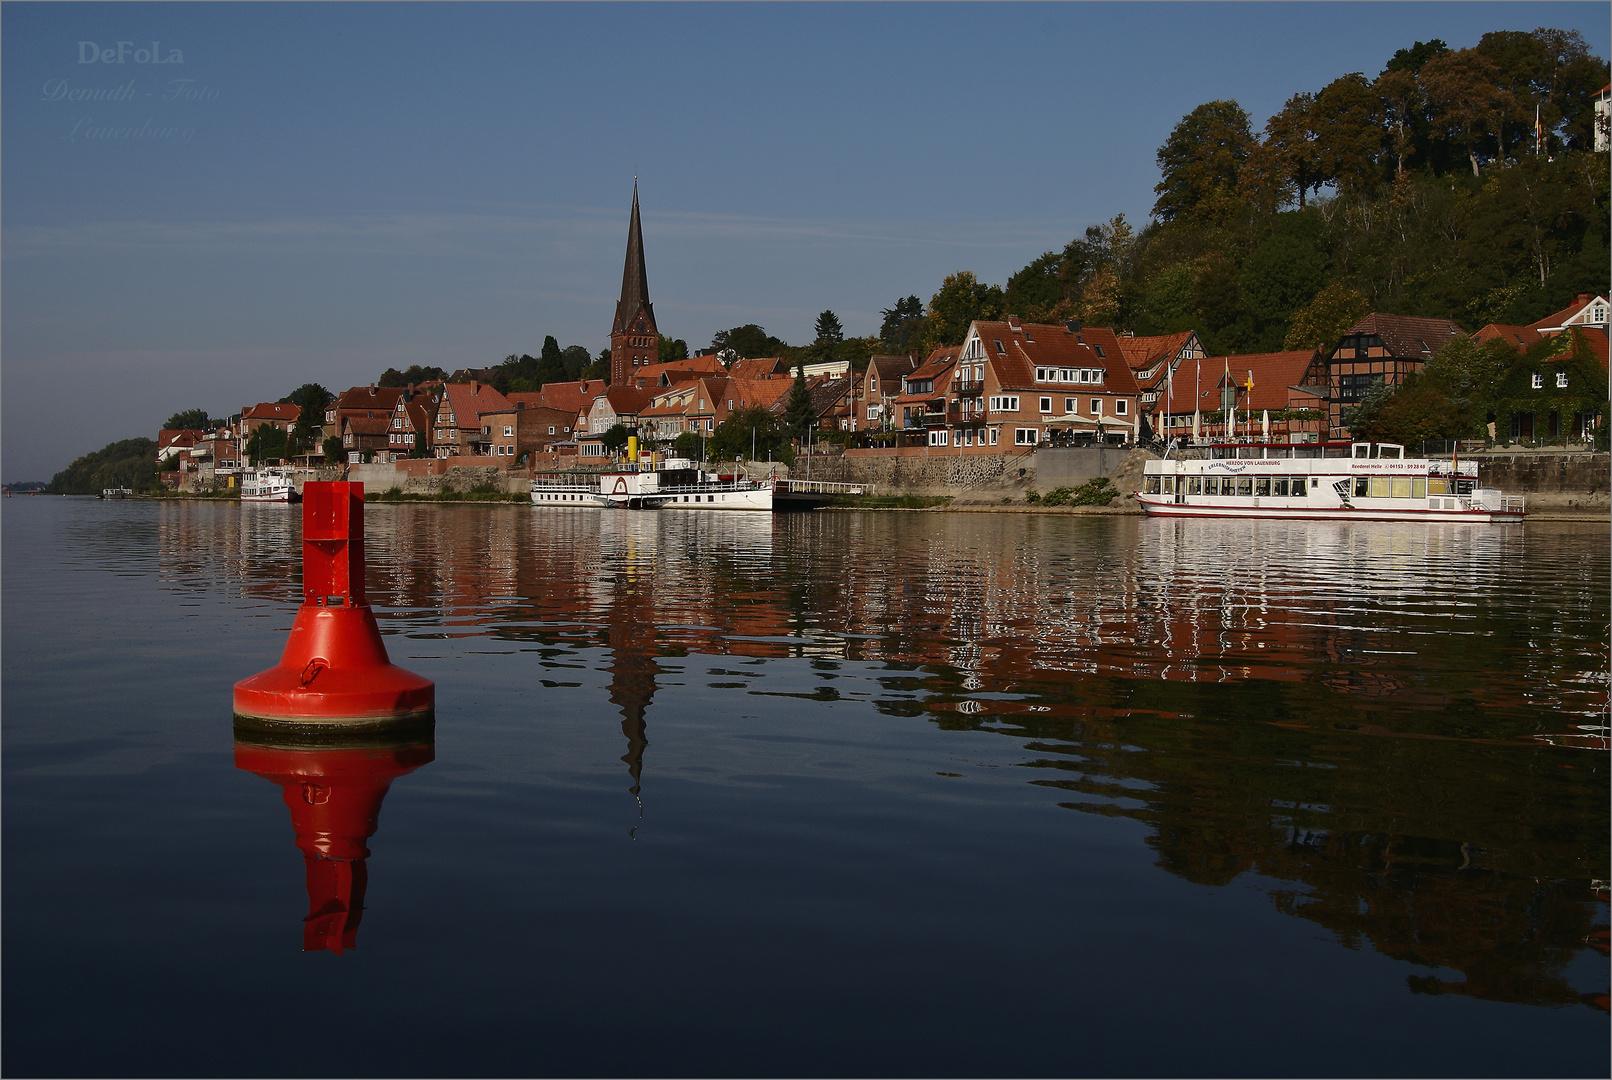 Lauenburg (10)